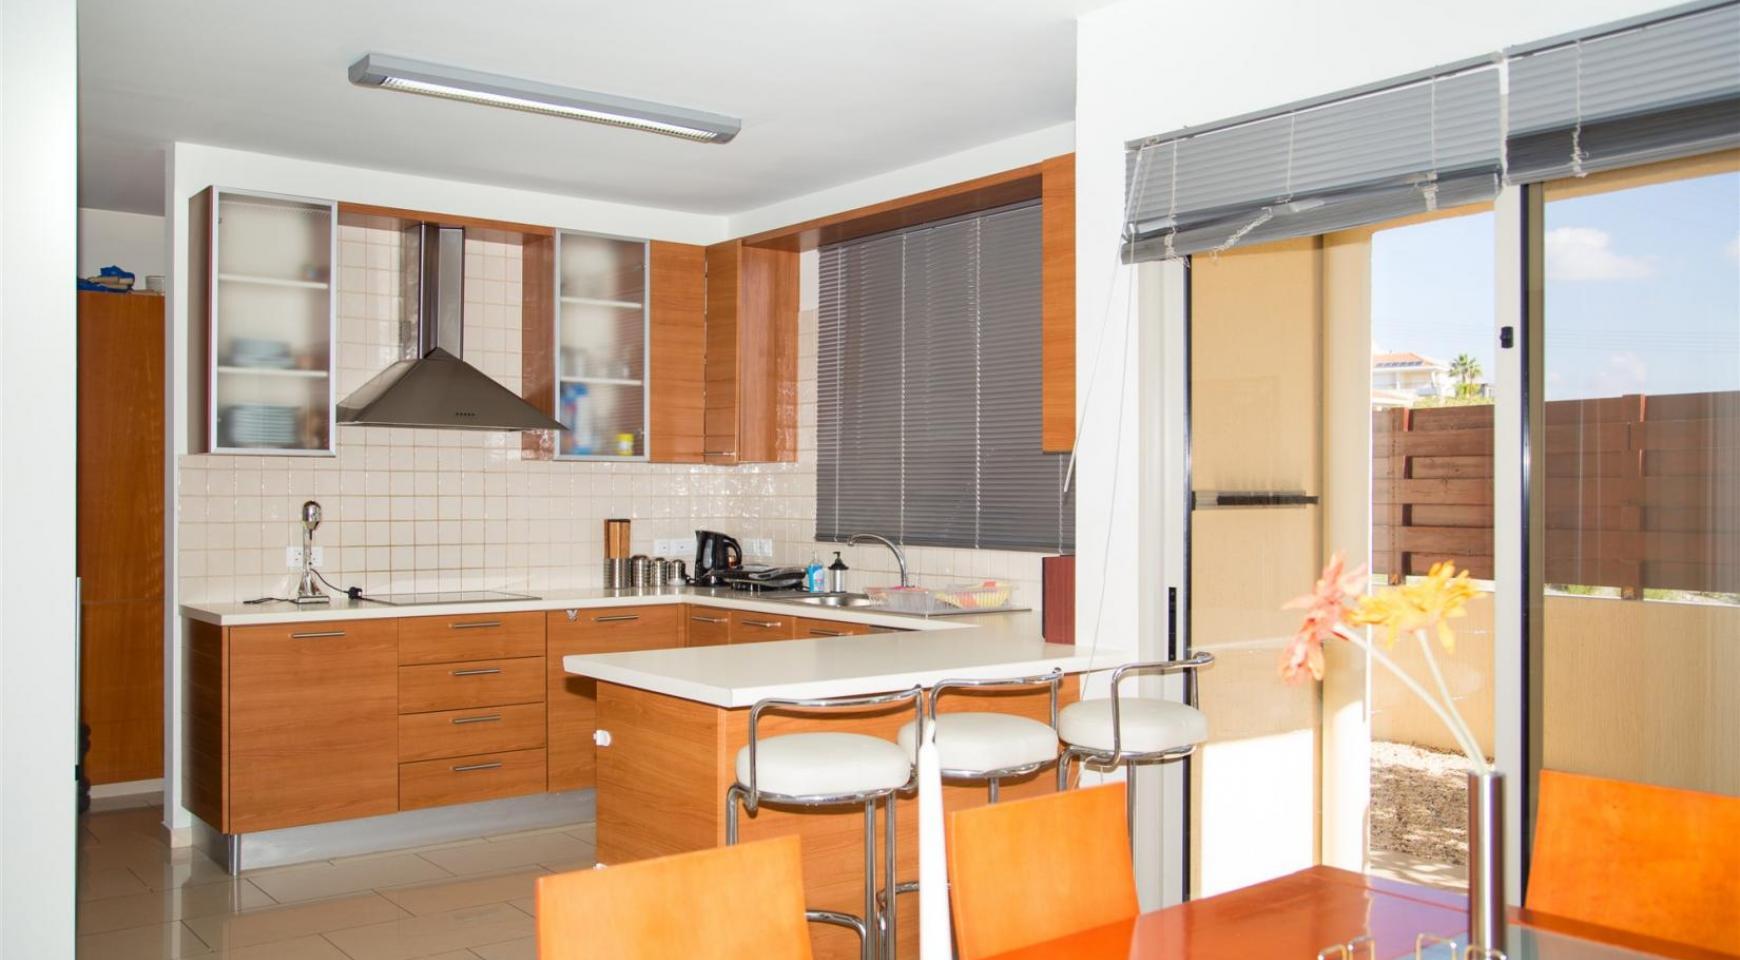 Modern Luxury 4 Bedroom Villa in Sfalagiotisa, Agios Athanasios - 23